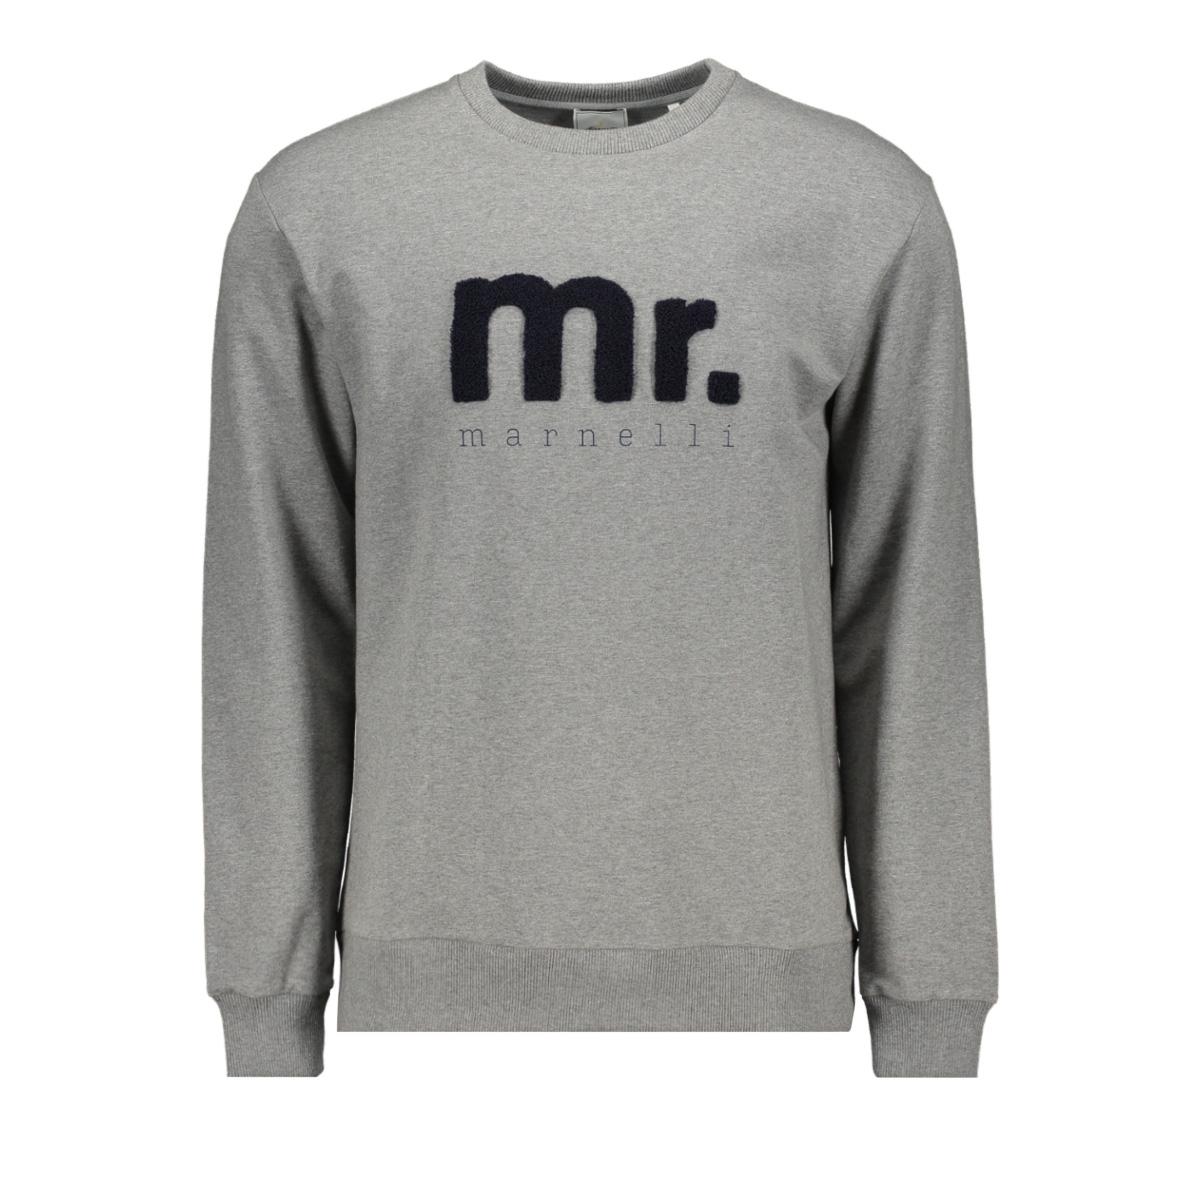 21 19sw204 5 marnelli sweater 026